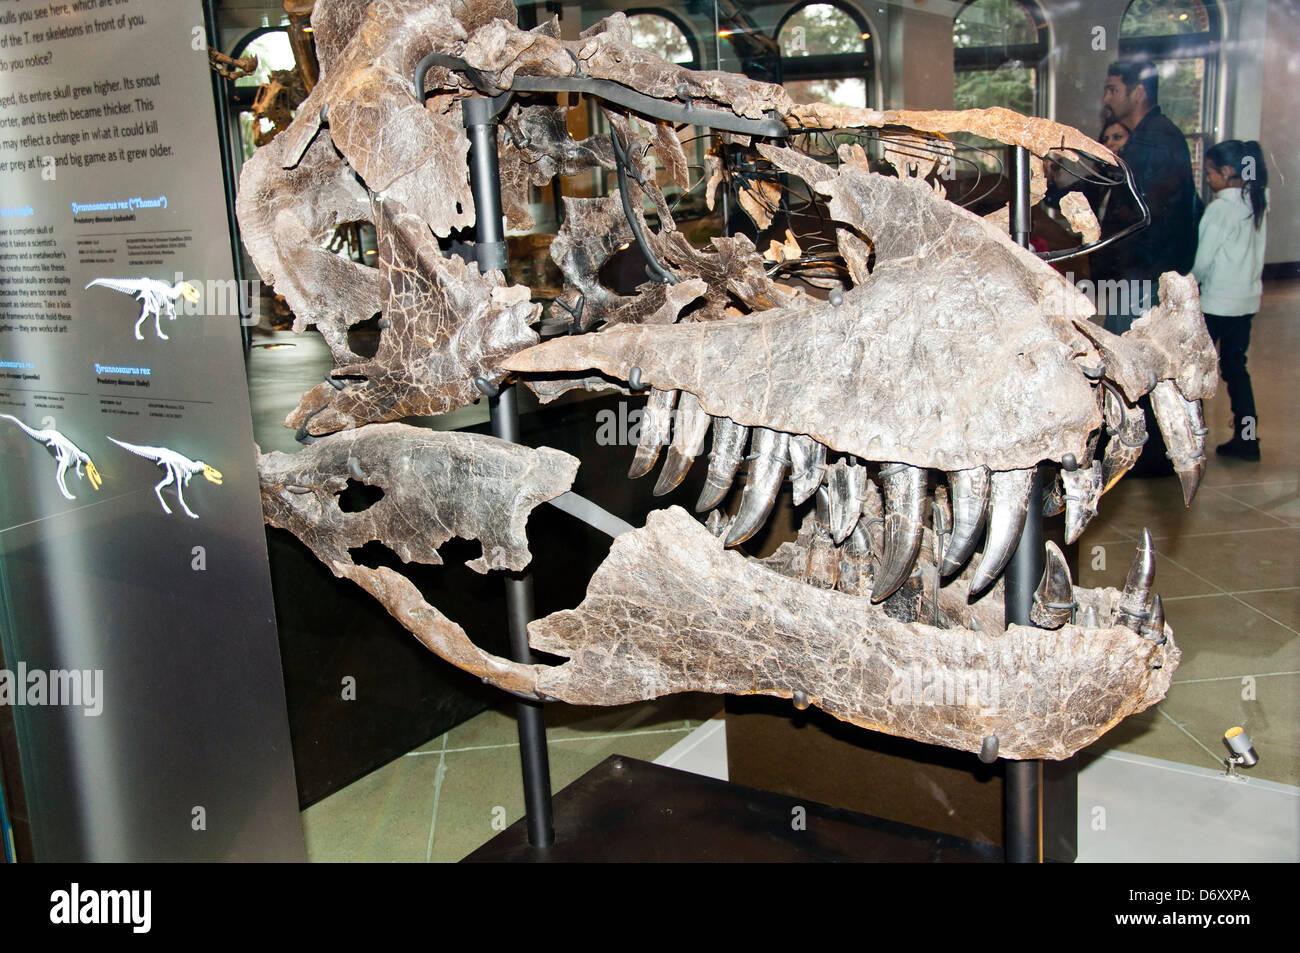 Dinosaur Skeleton, Natural History Museum of Los Angeles - Stock Image